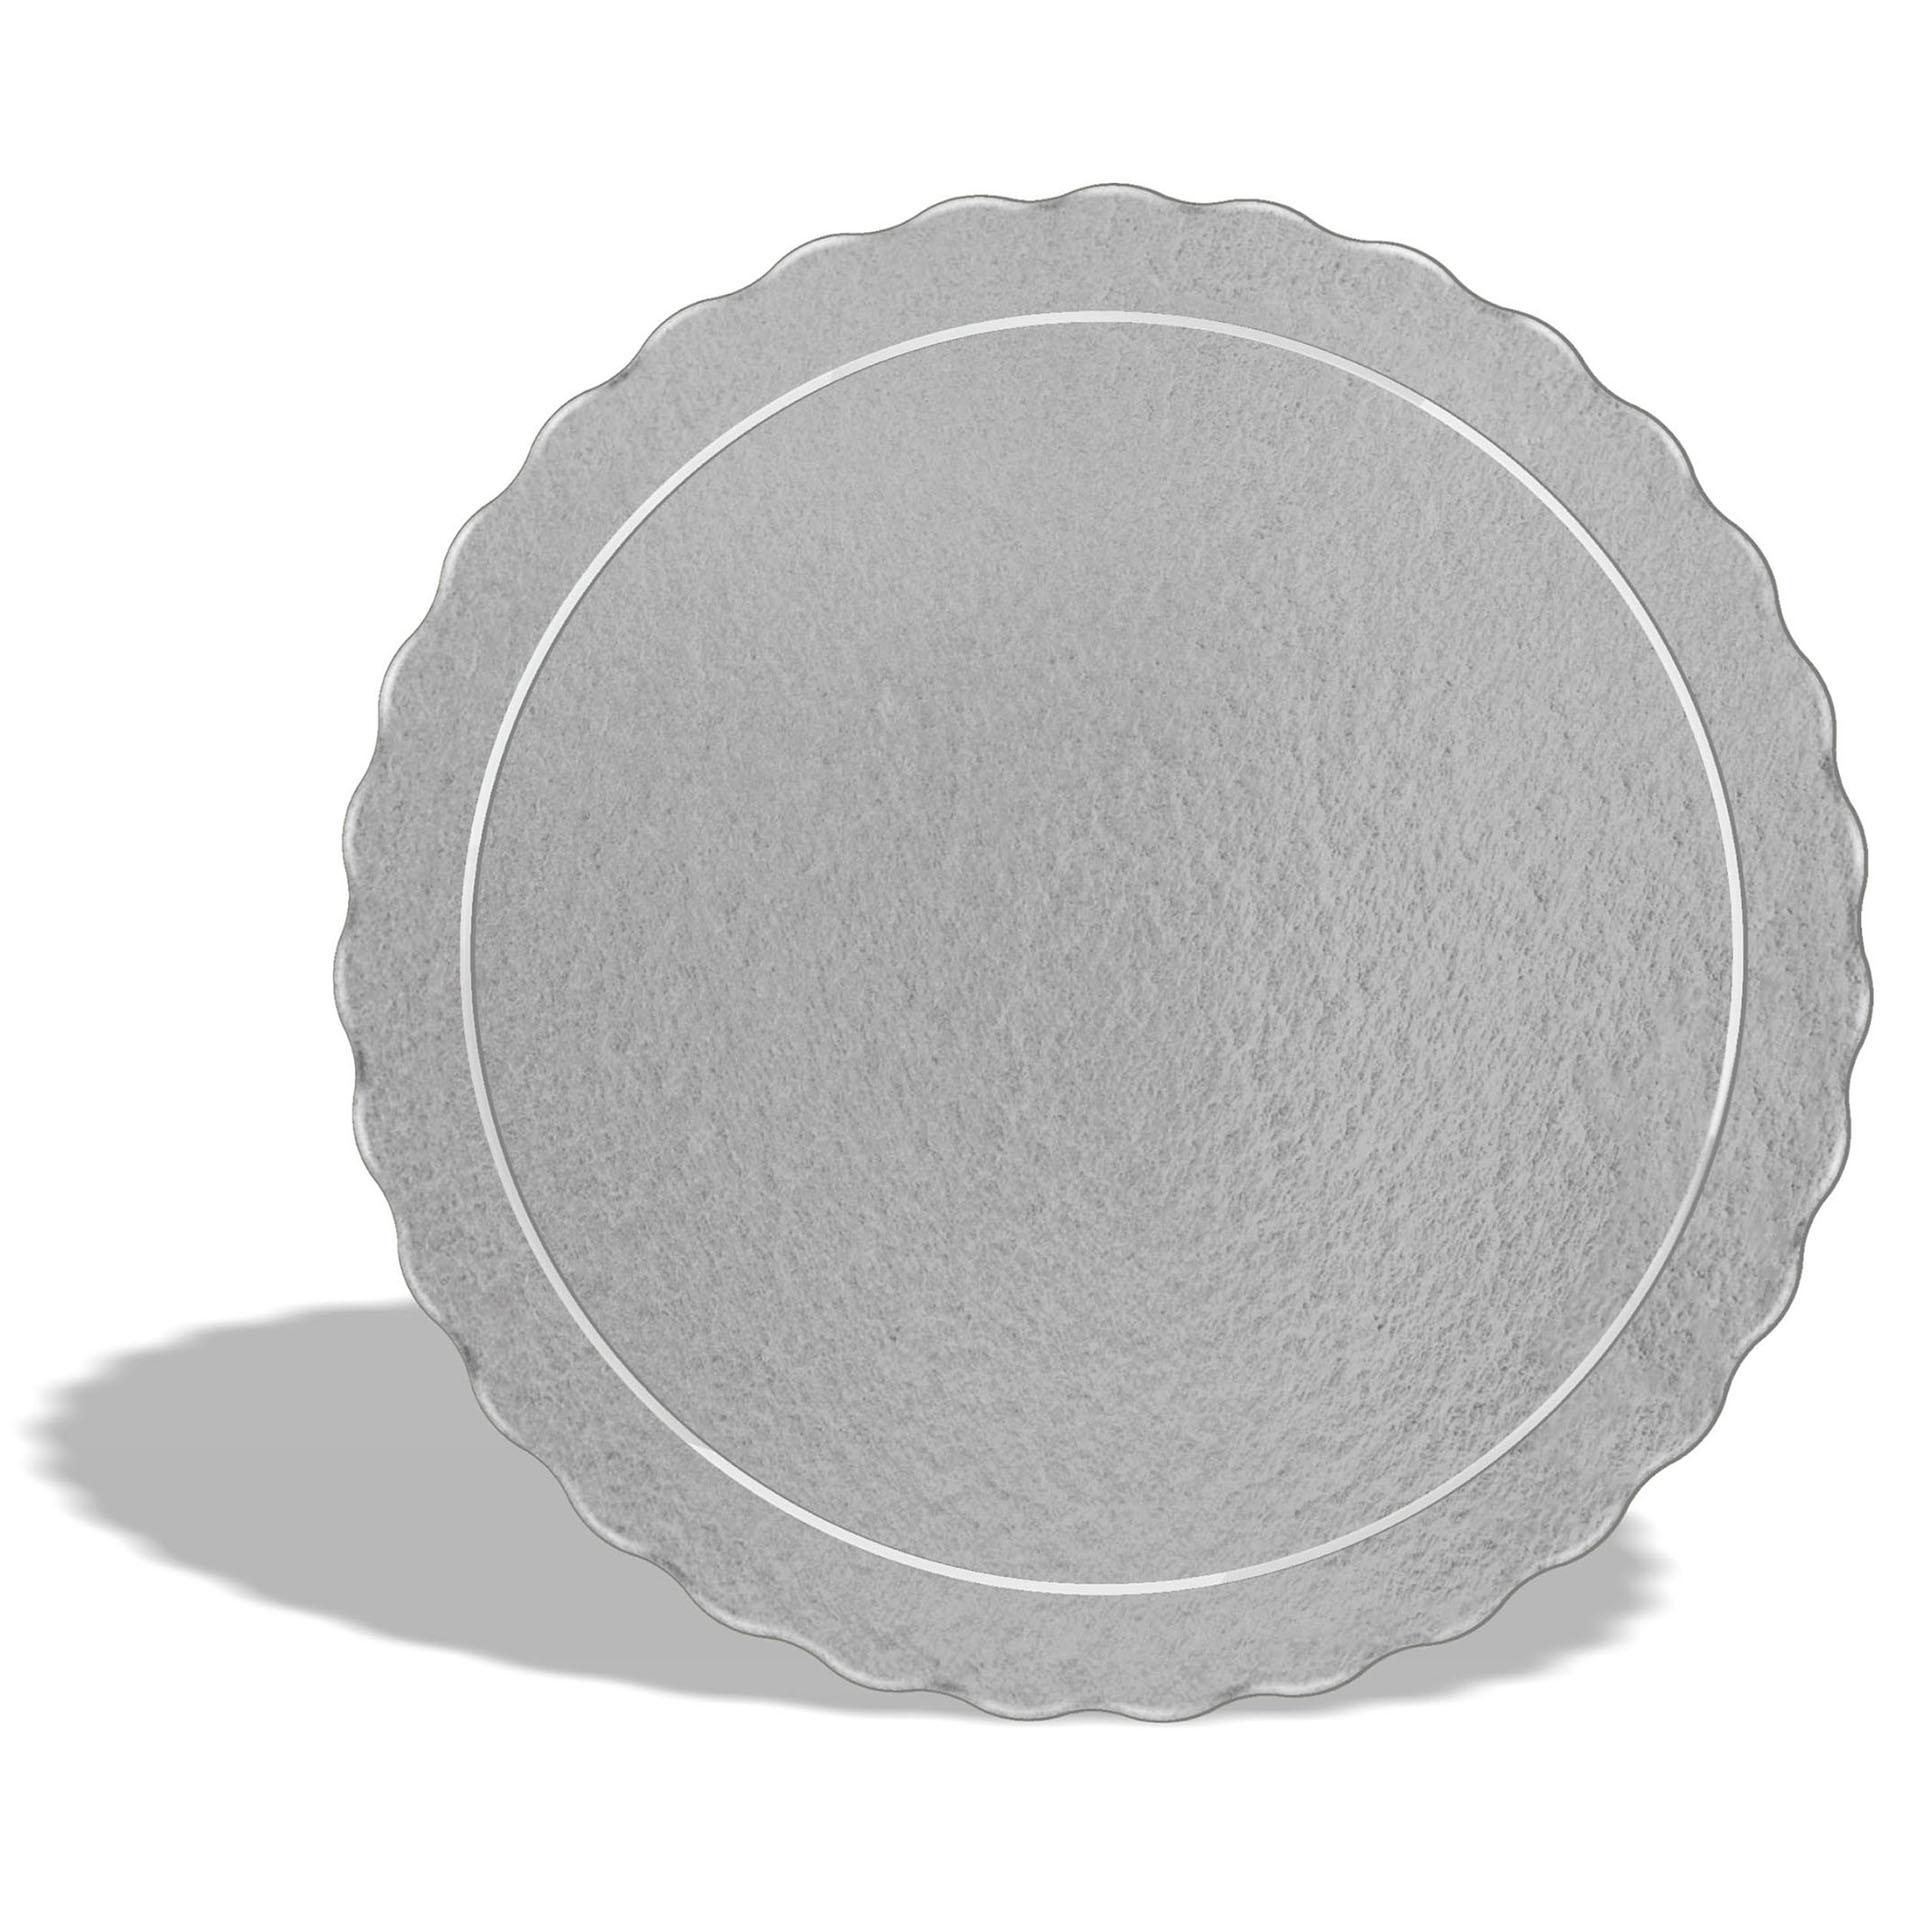 Kit 50 Bases Laminadas Para Bolo, Cake Board, 20 e 28cm - Prata